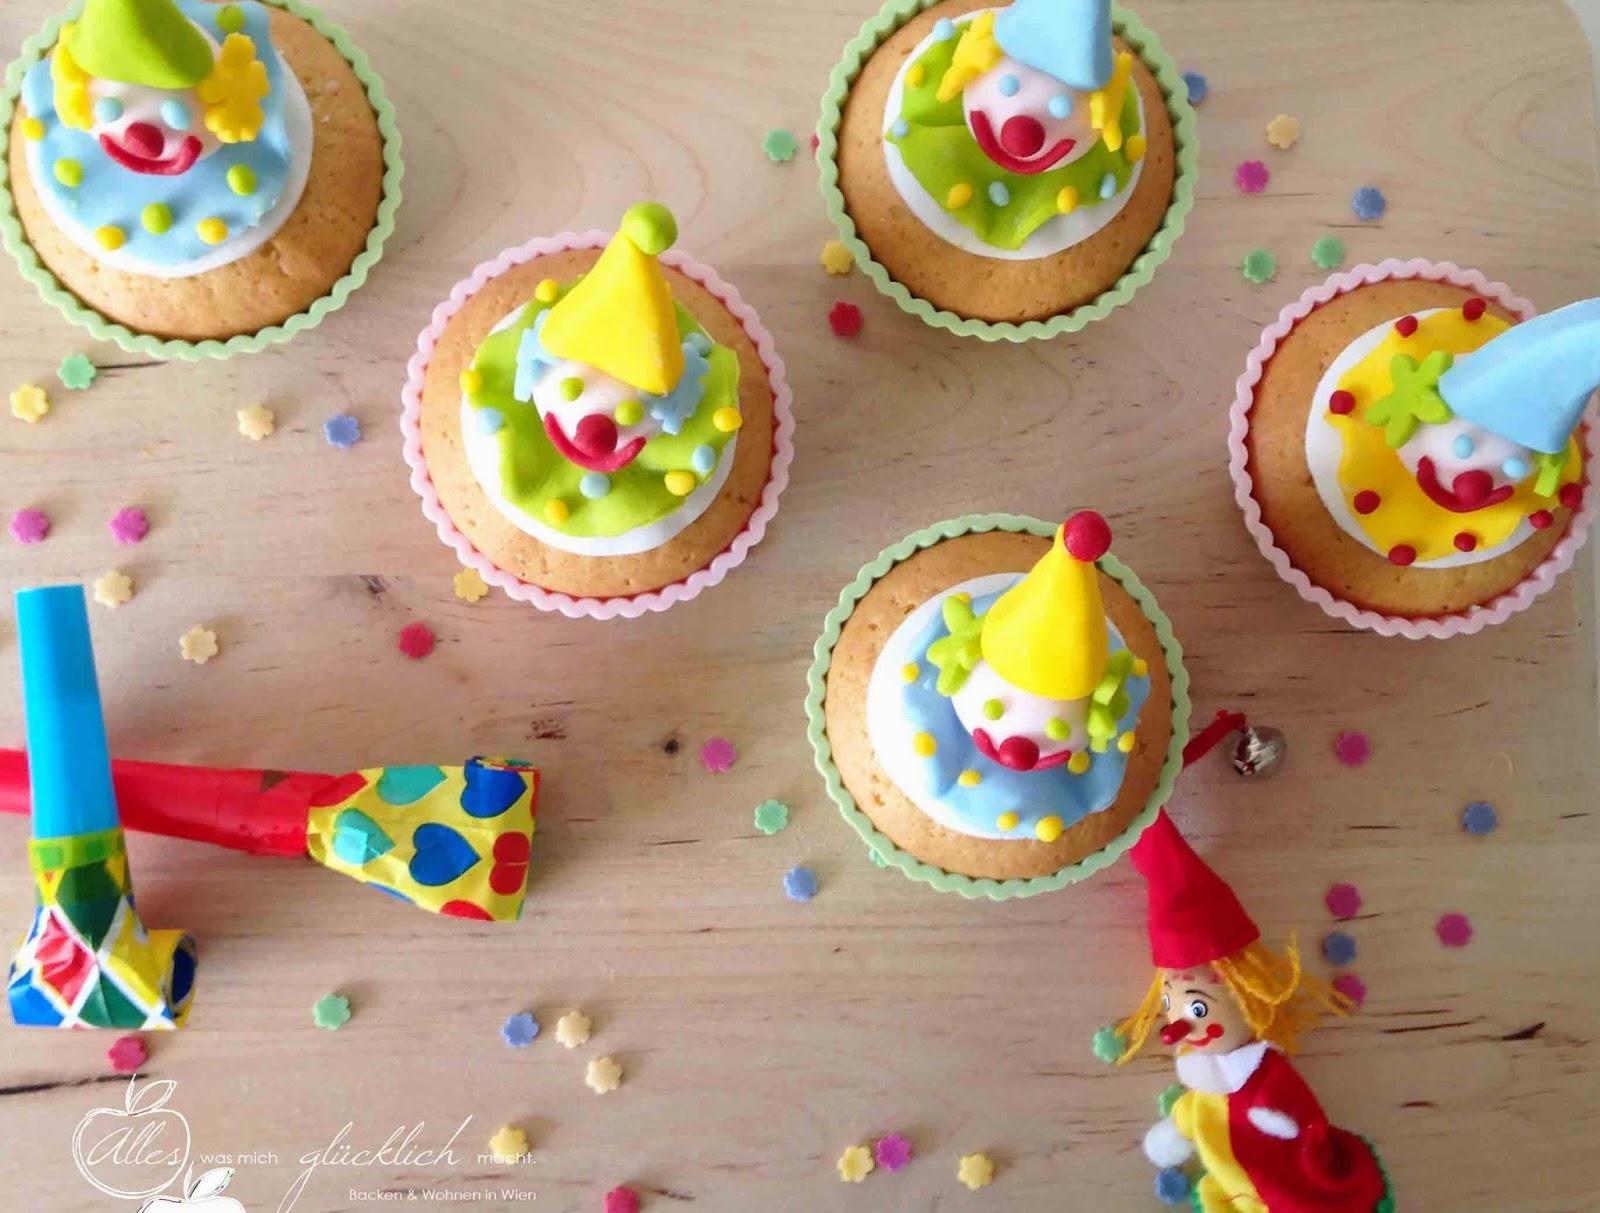 Lustig-fruchtige Clown Cupcakes mit Maracuja Füllung